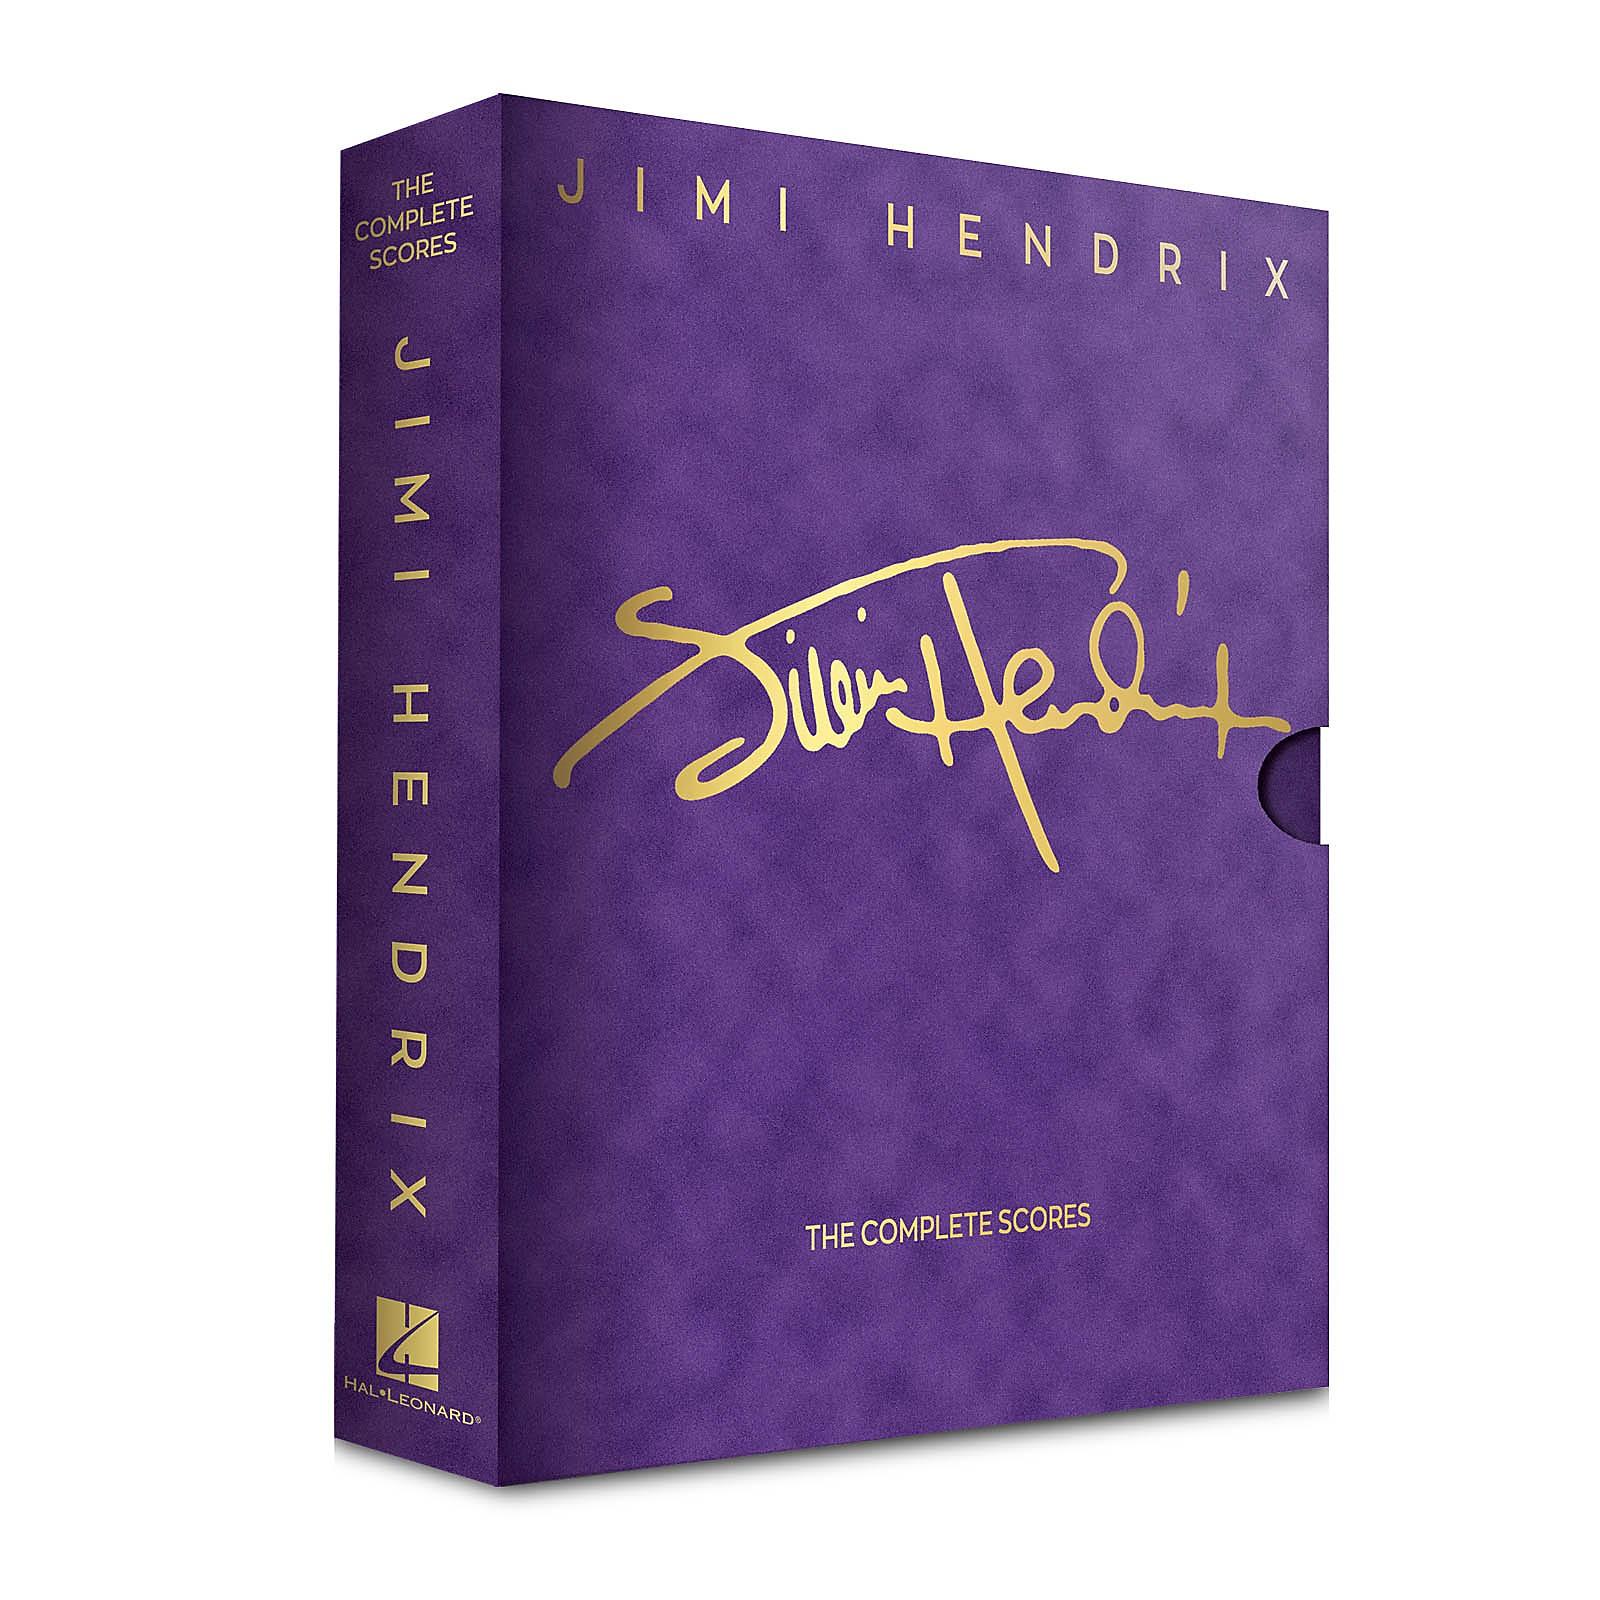 Hal Leonard Jimi Hendrix - The Complete Scores Transcribed Score